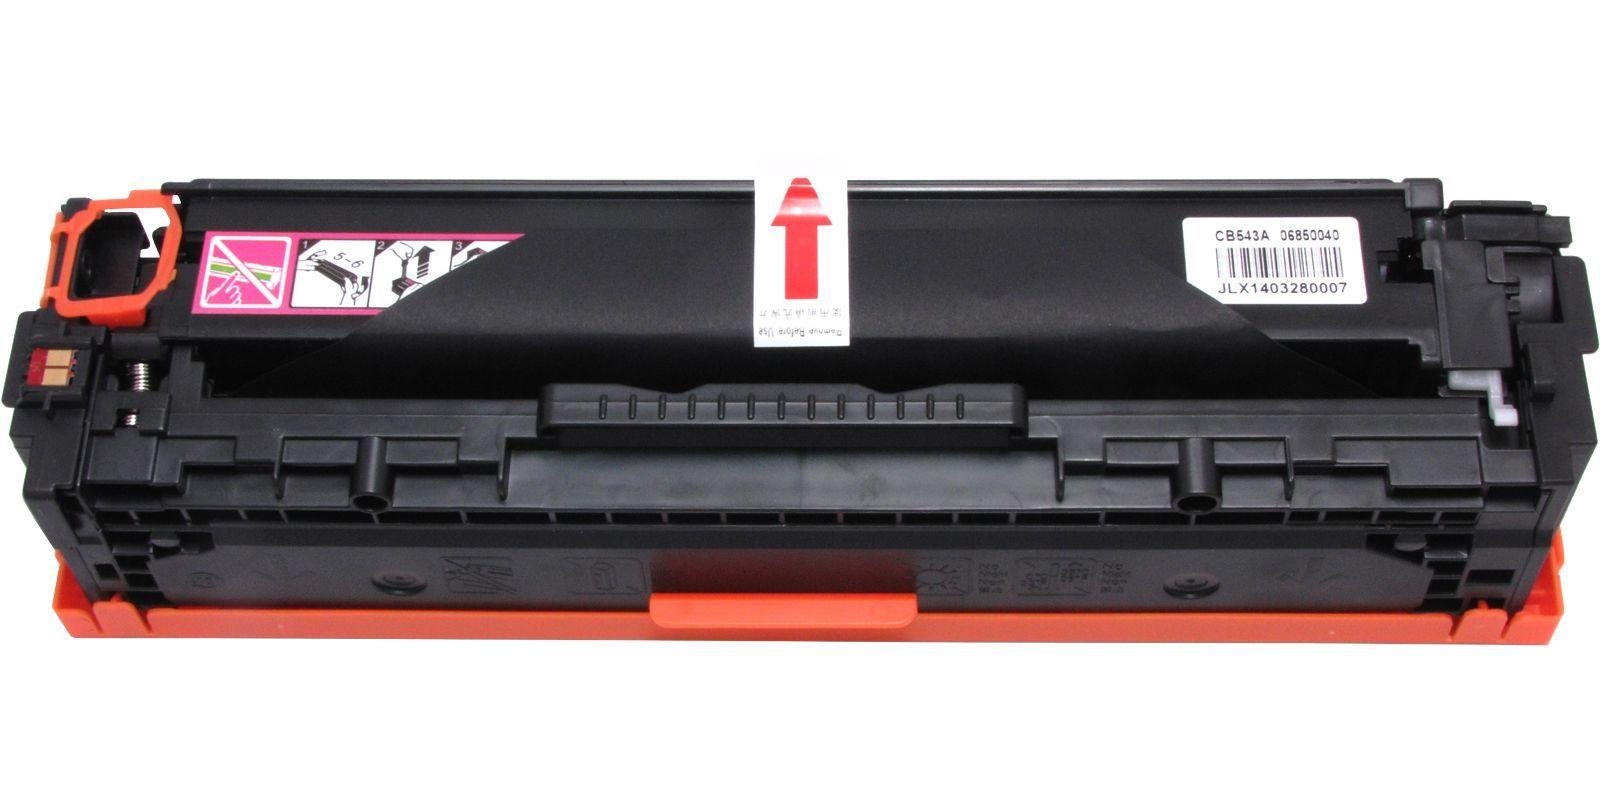 MAK №125A CB543A/Cartridge 316, 716, 416, 116 пурпурный (magenta), для HP/Canon, до 1400 стр.